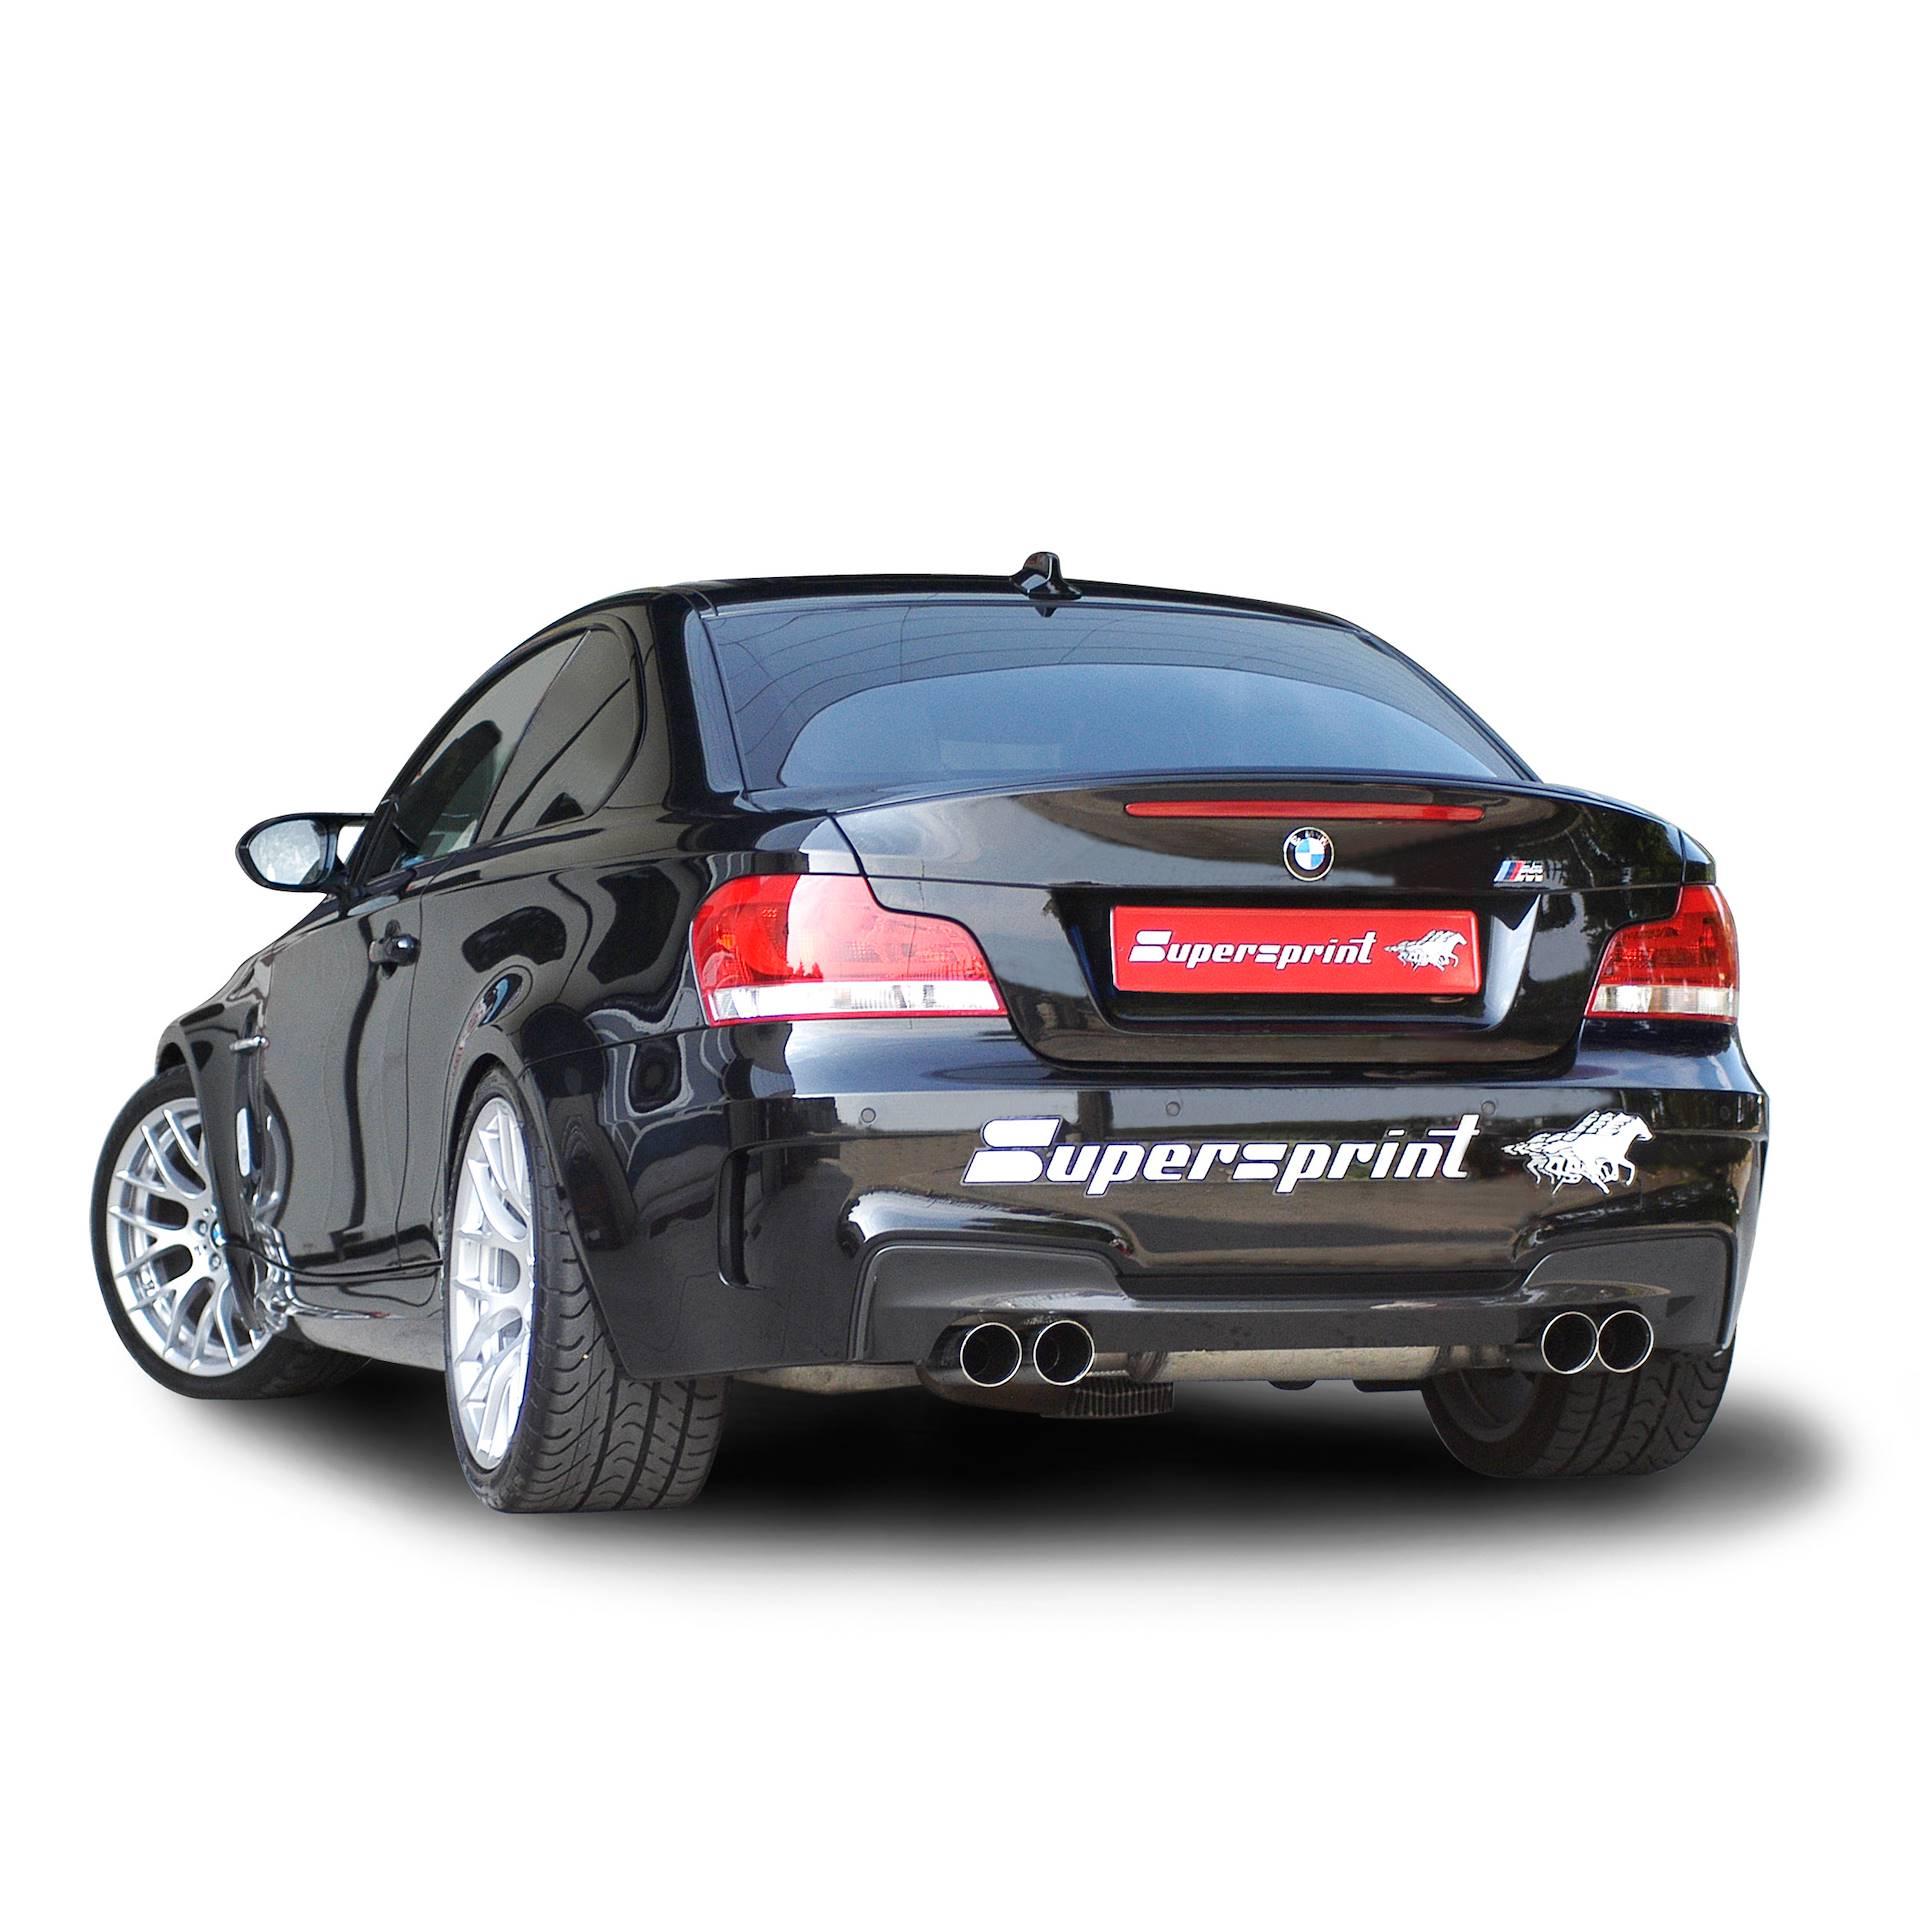 Bmw Zed 1: BMW E82 1er M Coupé (340 PS) 2011 ->, BMW M, Abgassysteme